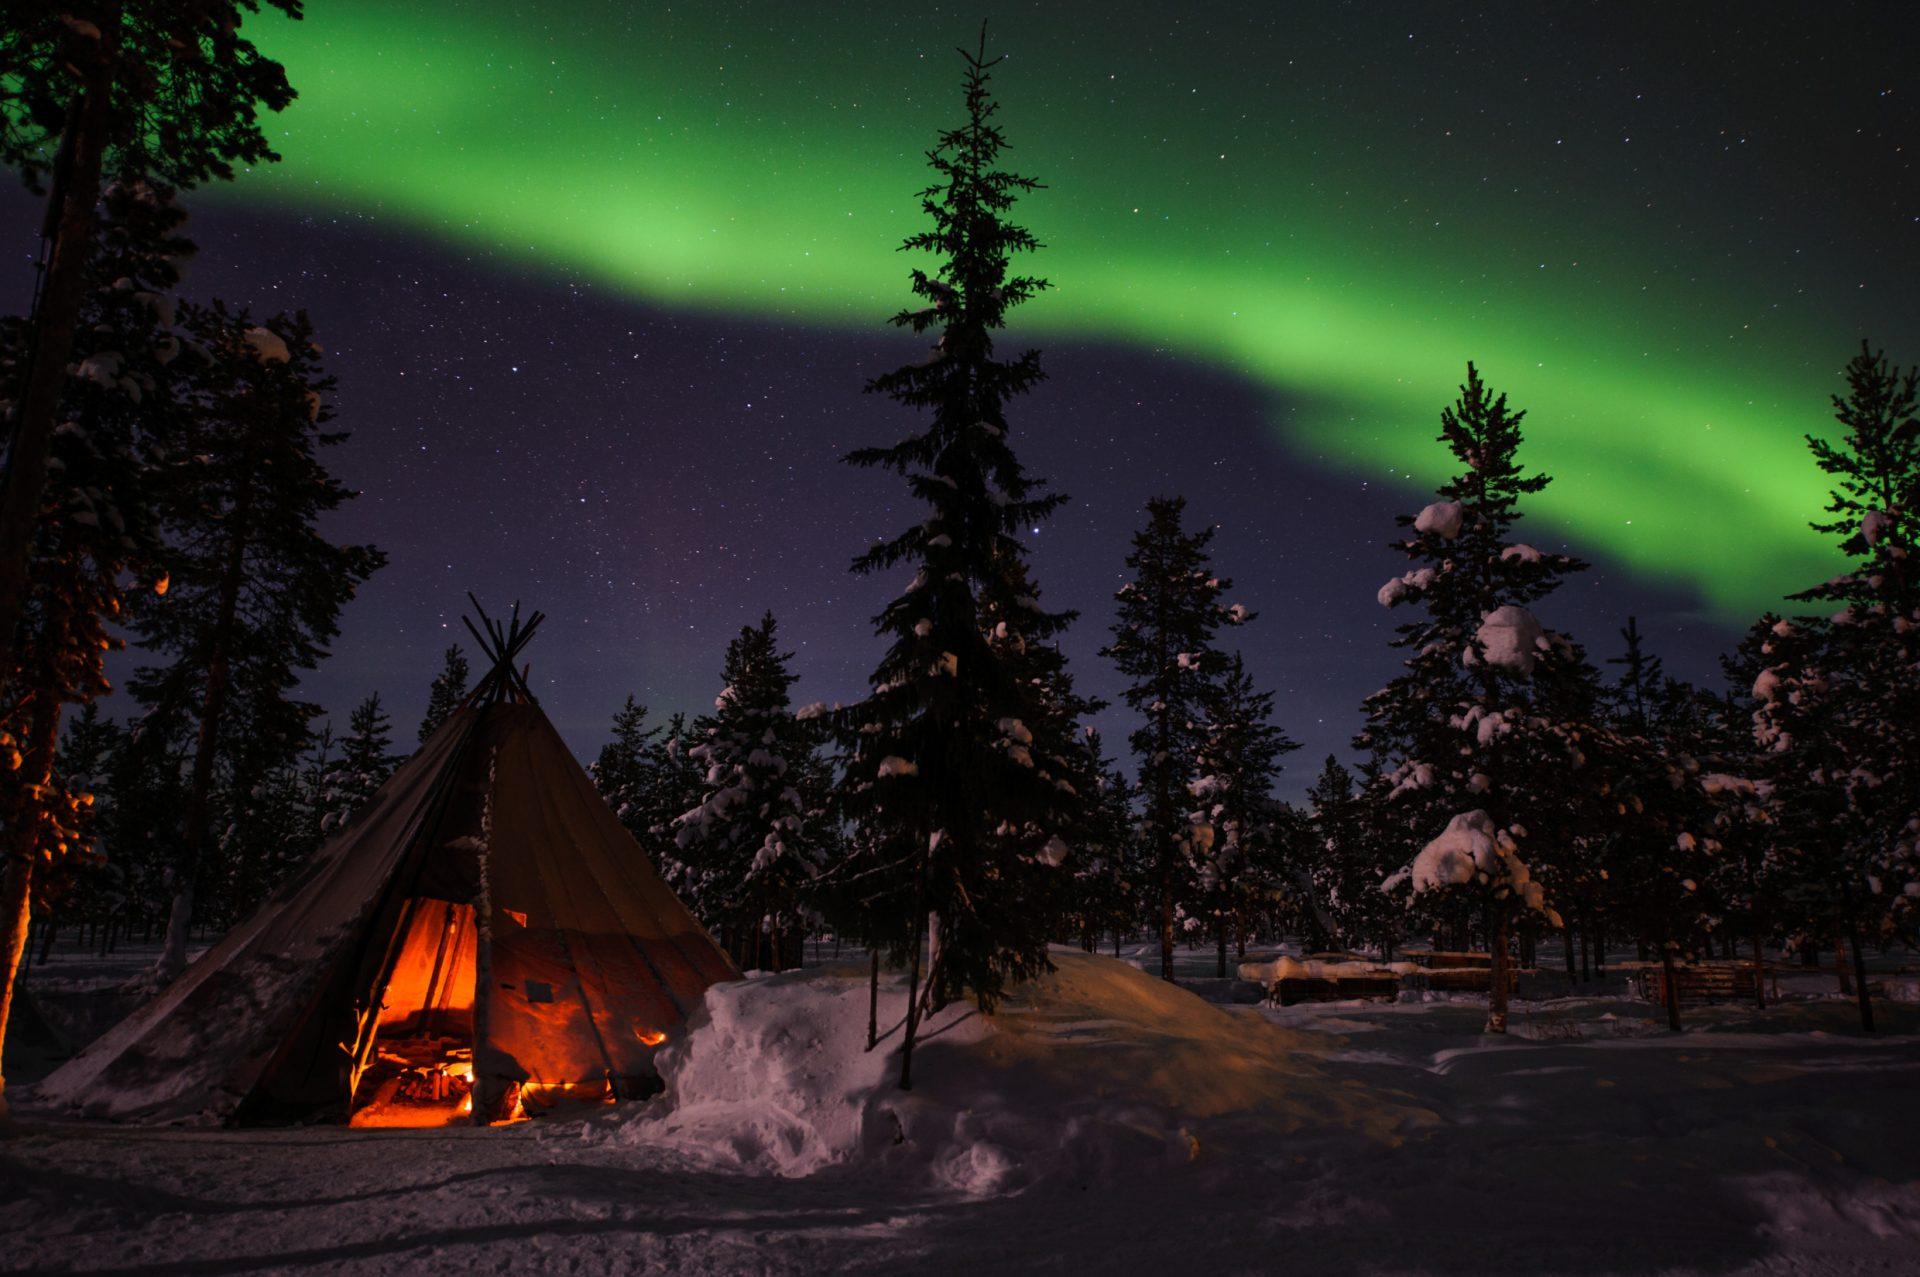 lola_akinmade_Akerstroem-northern_lights-2602